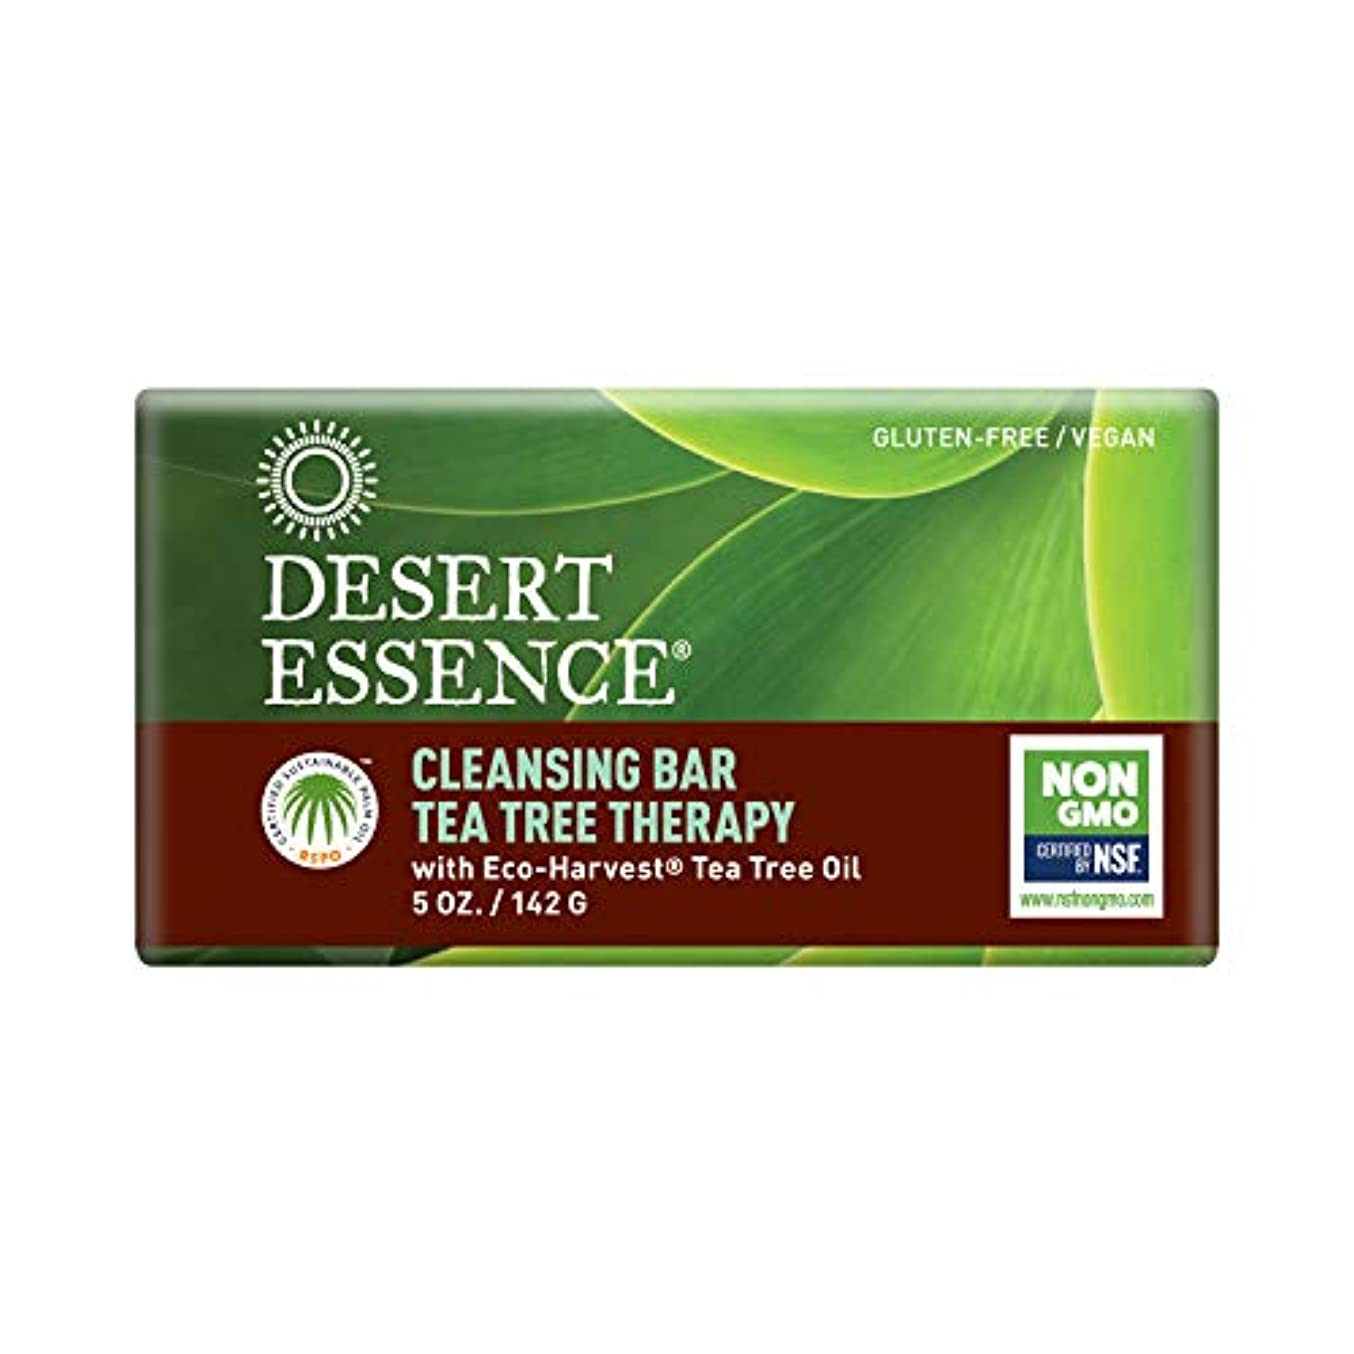 巨人不純万歳海外直送品Desert Essence Tea Tree Therapy Cleansing Bar Soap, 5 oz